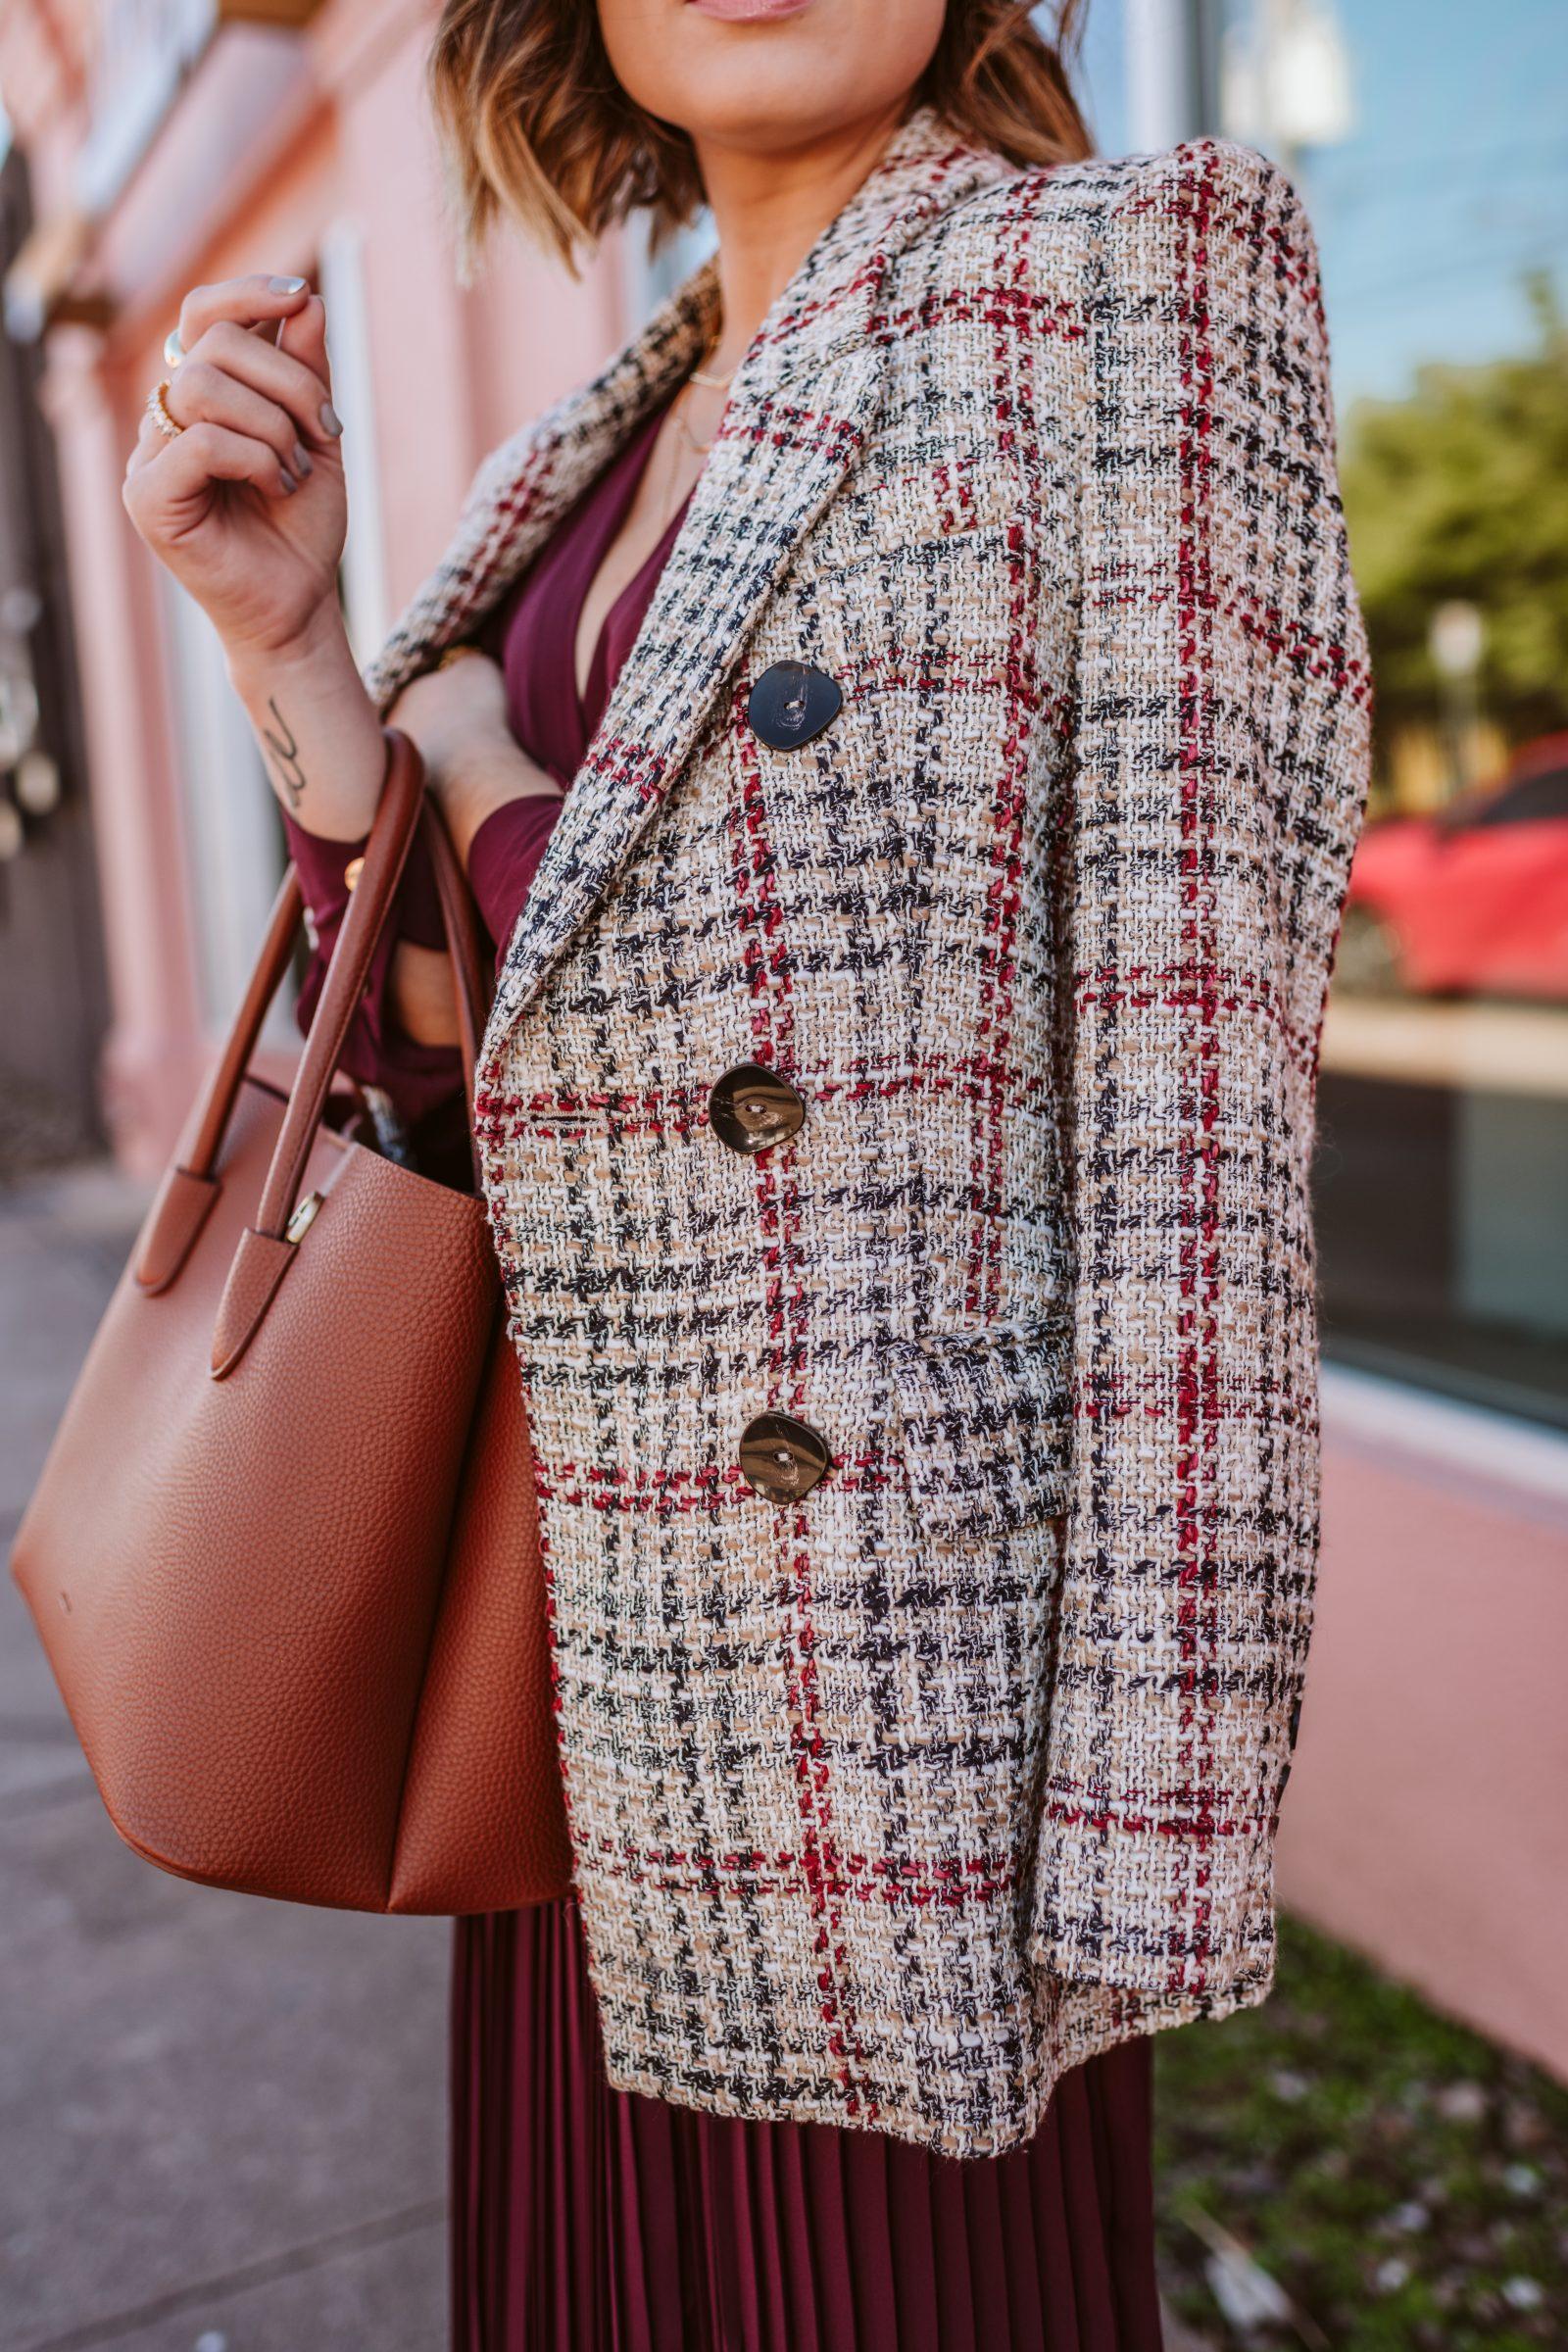 Zara tweed blazer worn with a dress for a winter outfit